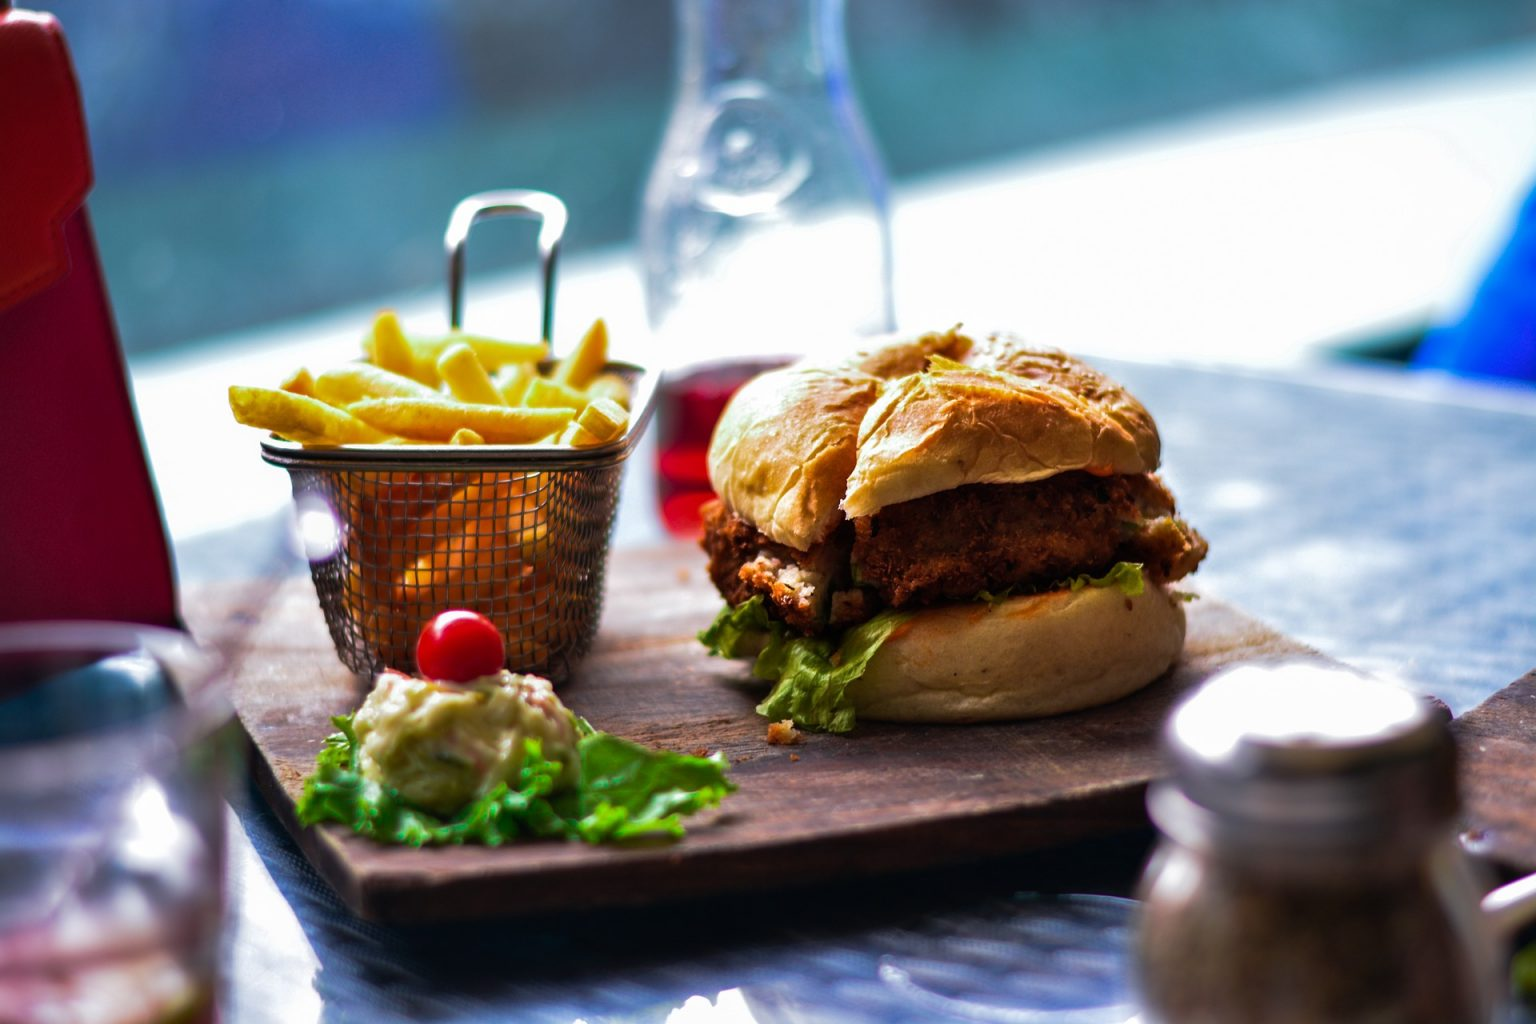 Fries, burger and soda. Standard American Diet